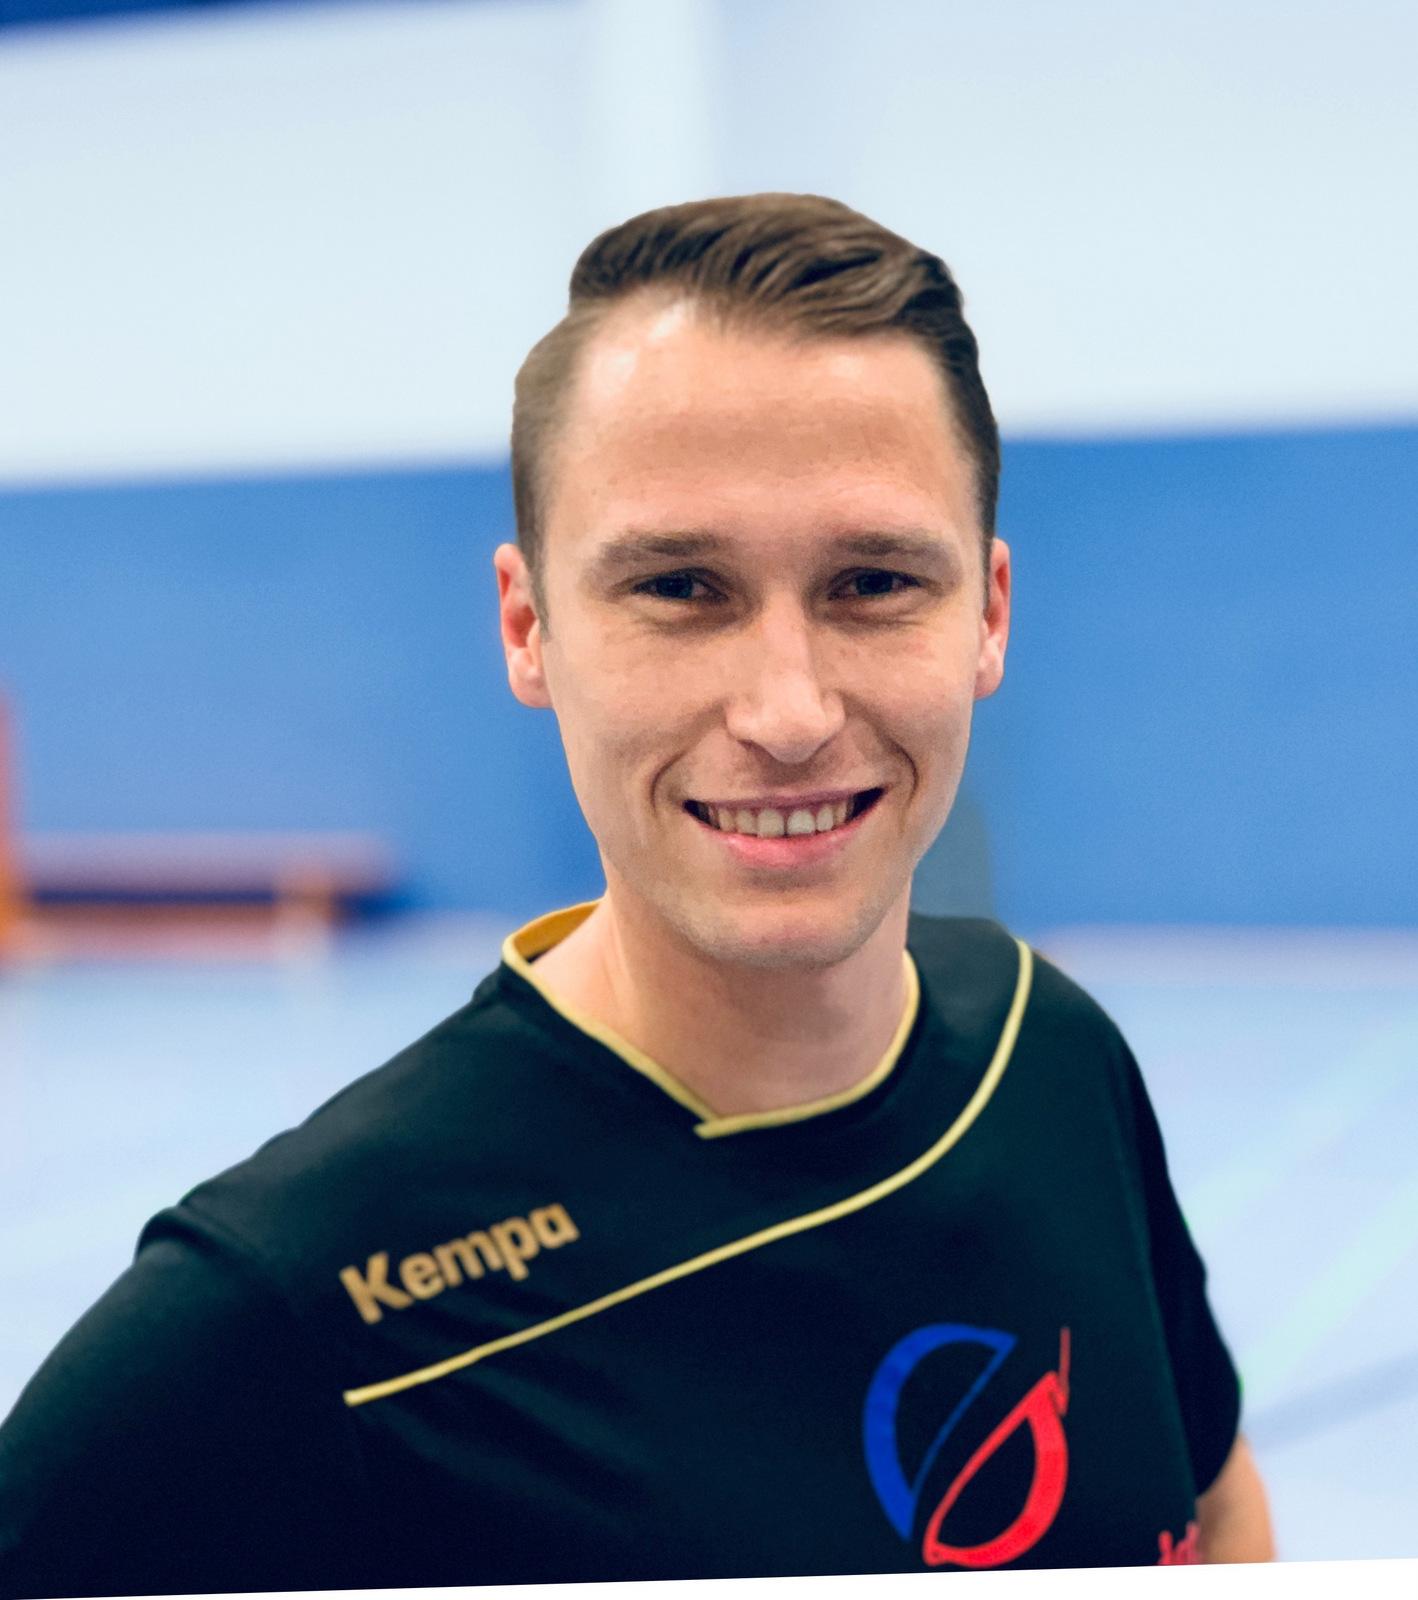 Hendrik Wätzig